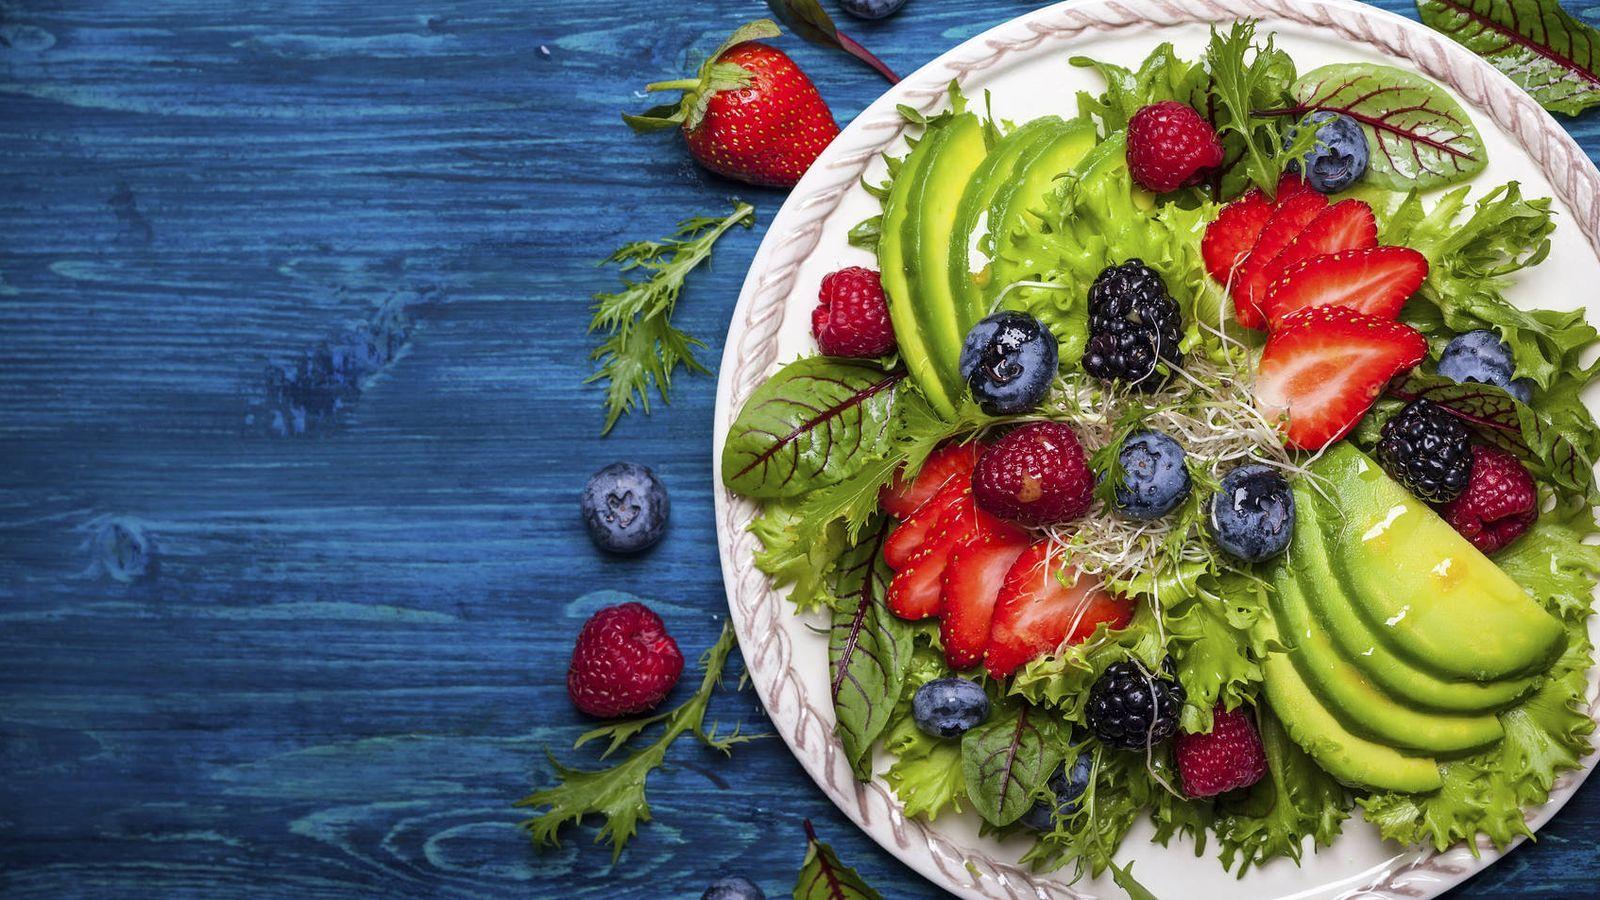 5e4aa791a Dietas: La dieta para adelgazar 11 kg en tres semanas que está arrasando